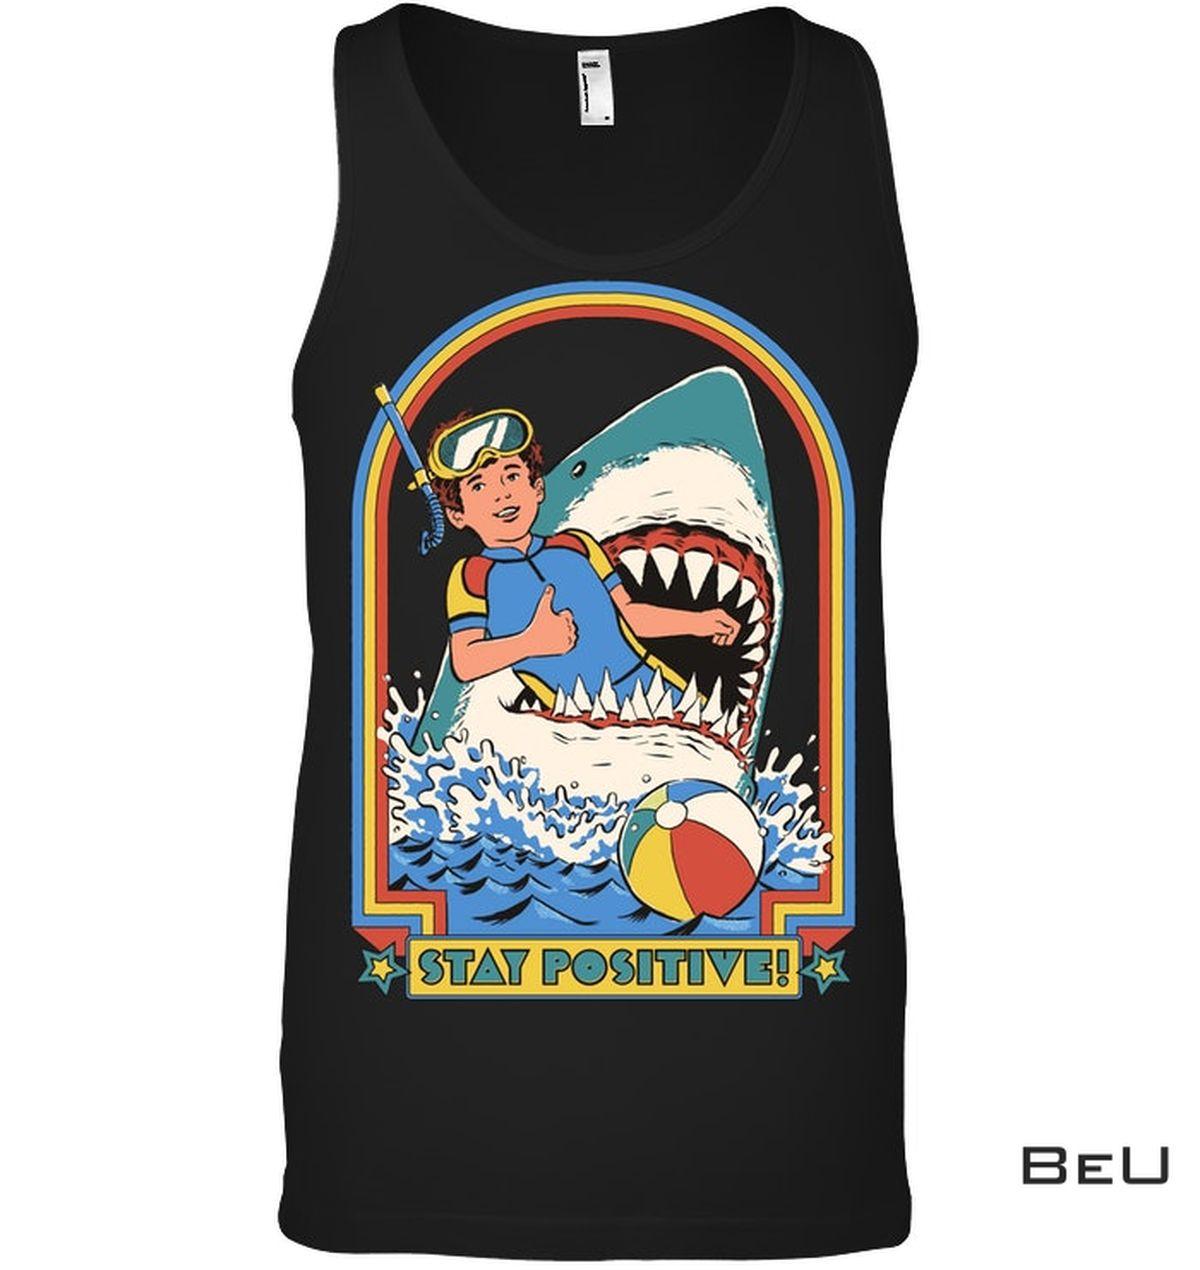 Stay Positive Shark Shirt b